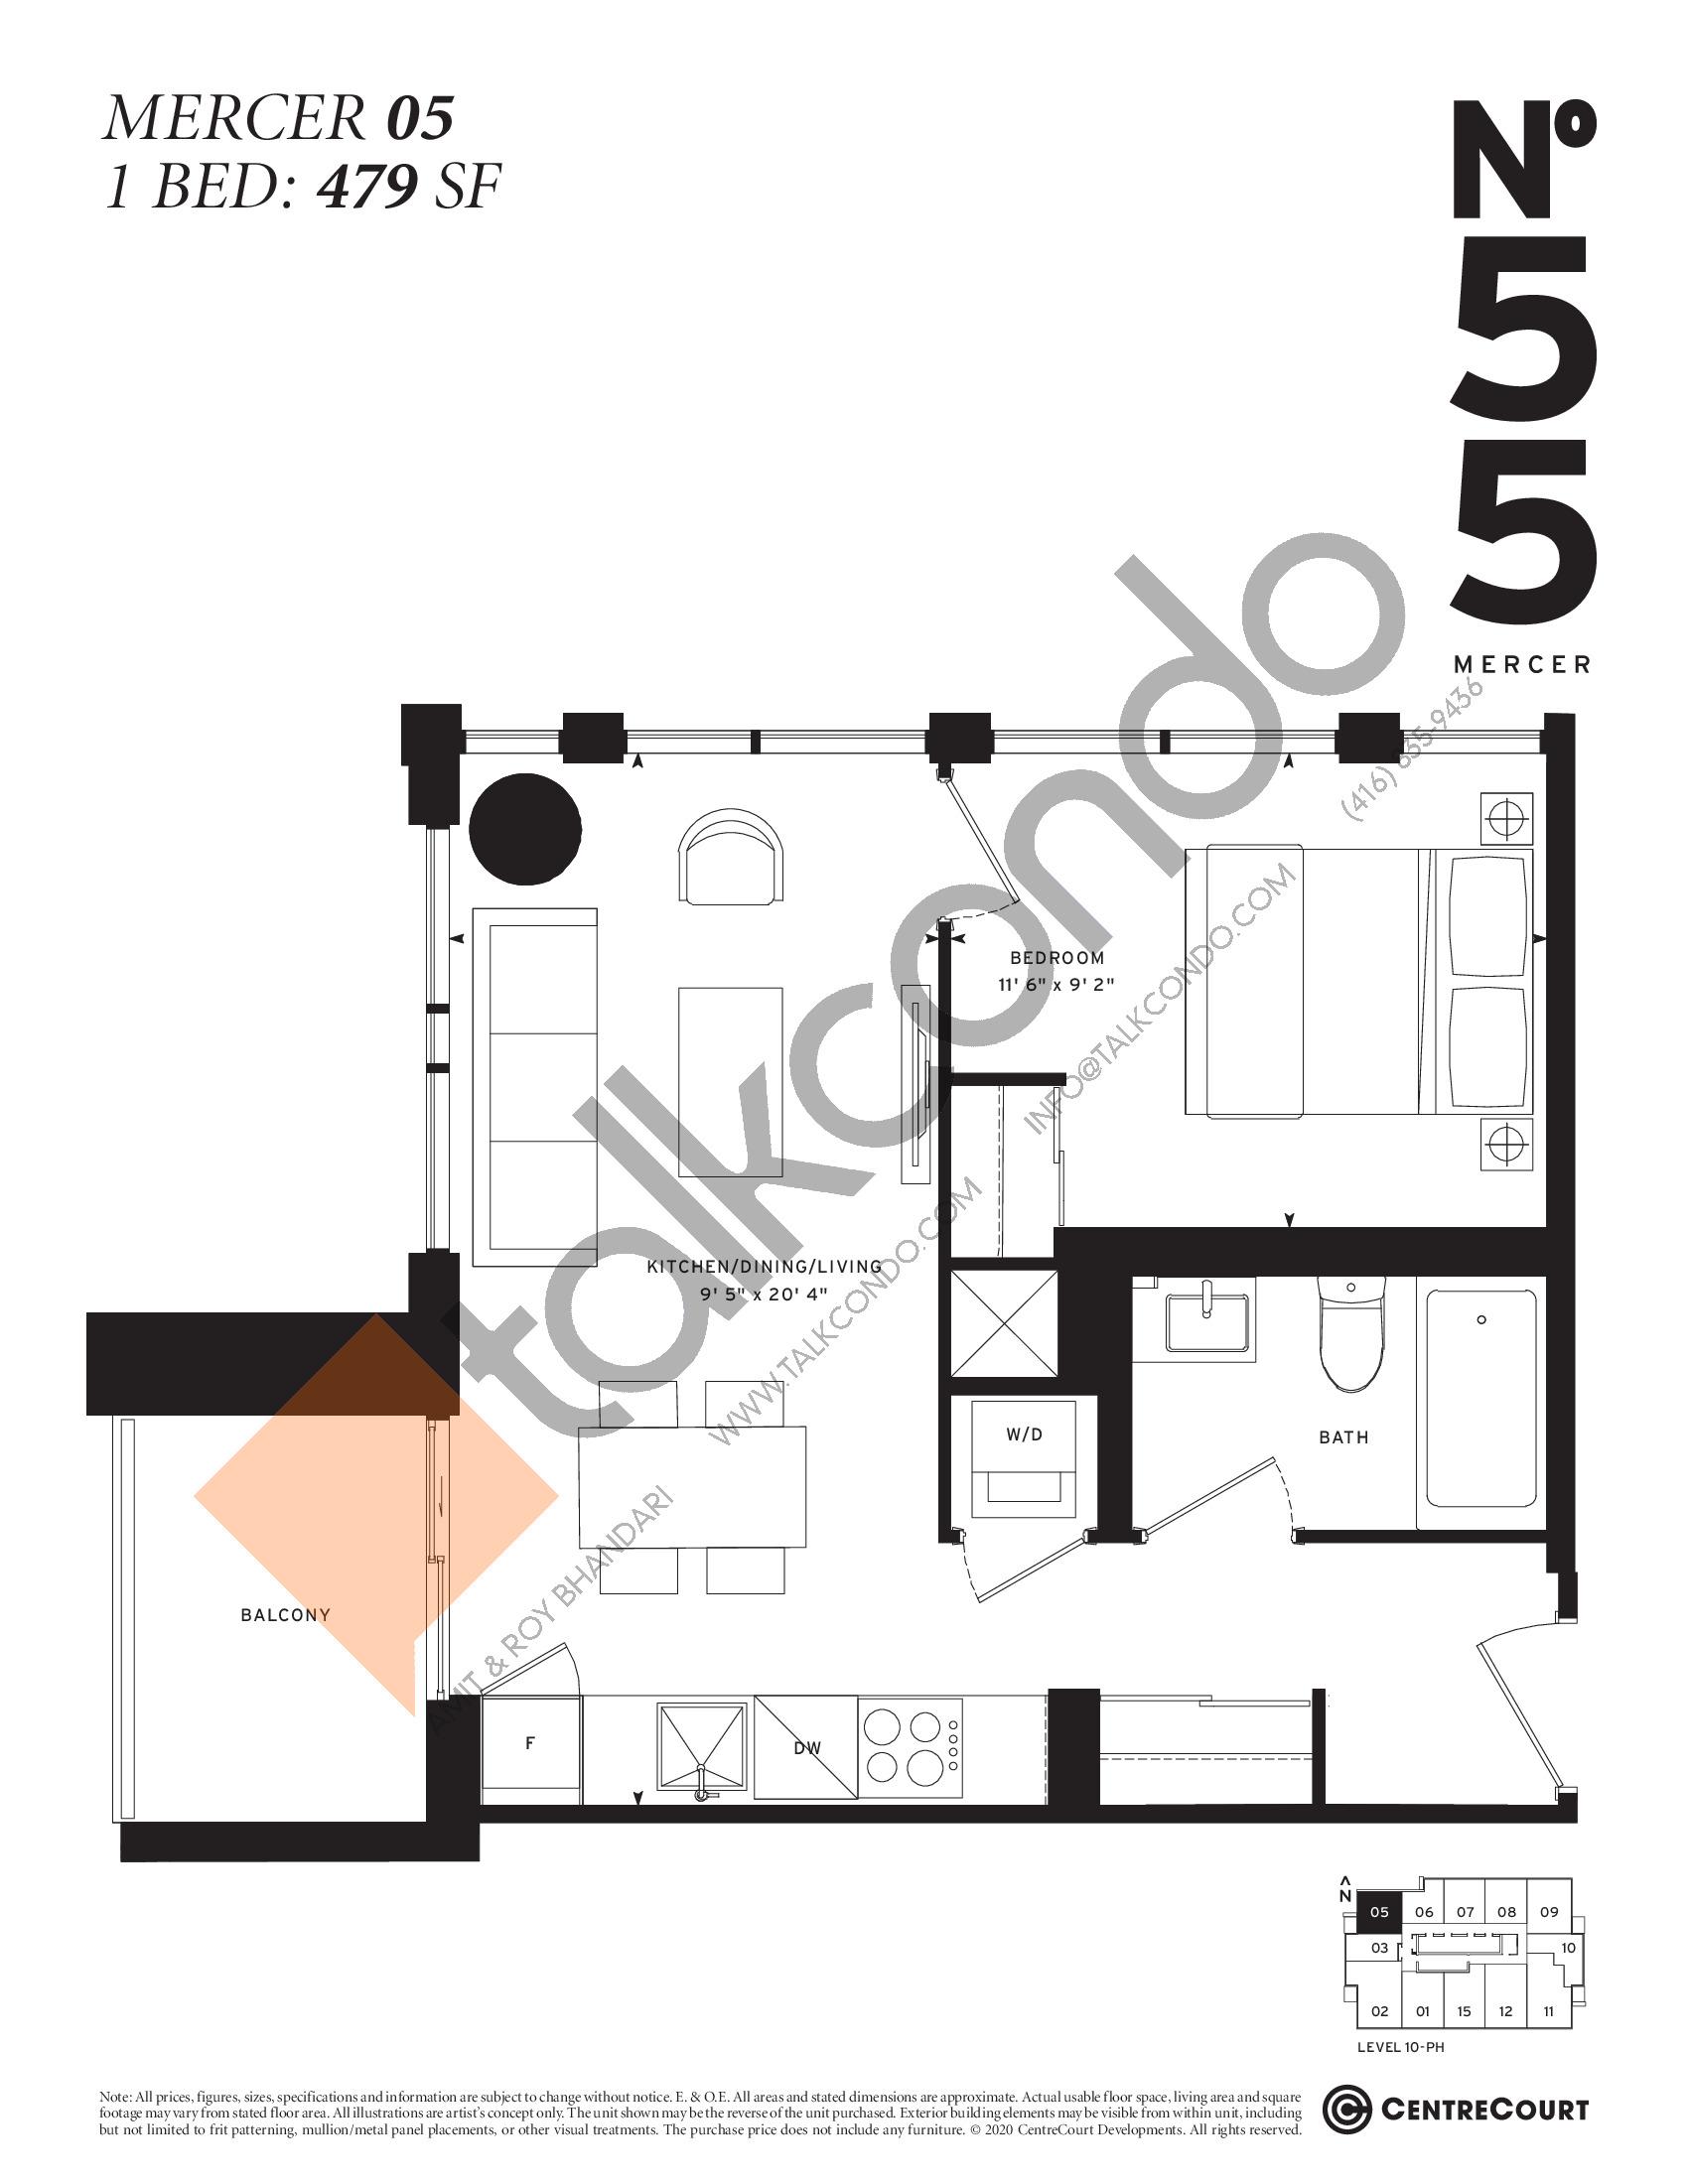 Mercer 05 Floor Plan at No. 55 Mercer Condos - 479 sq.ft